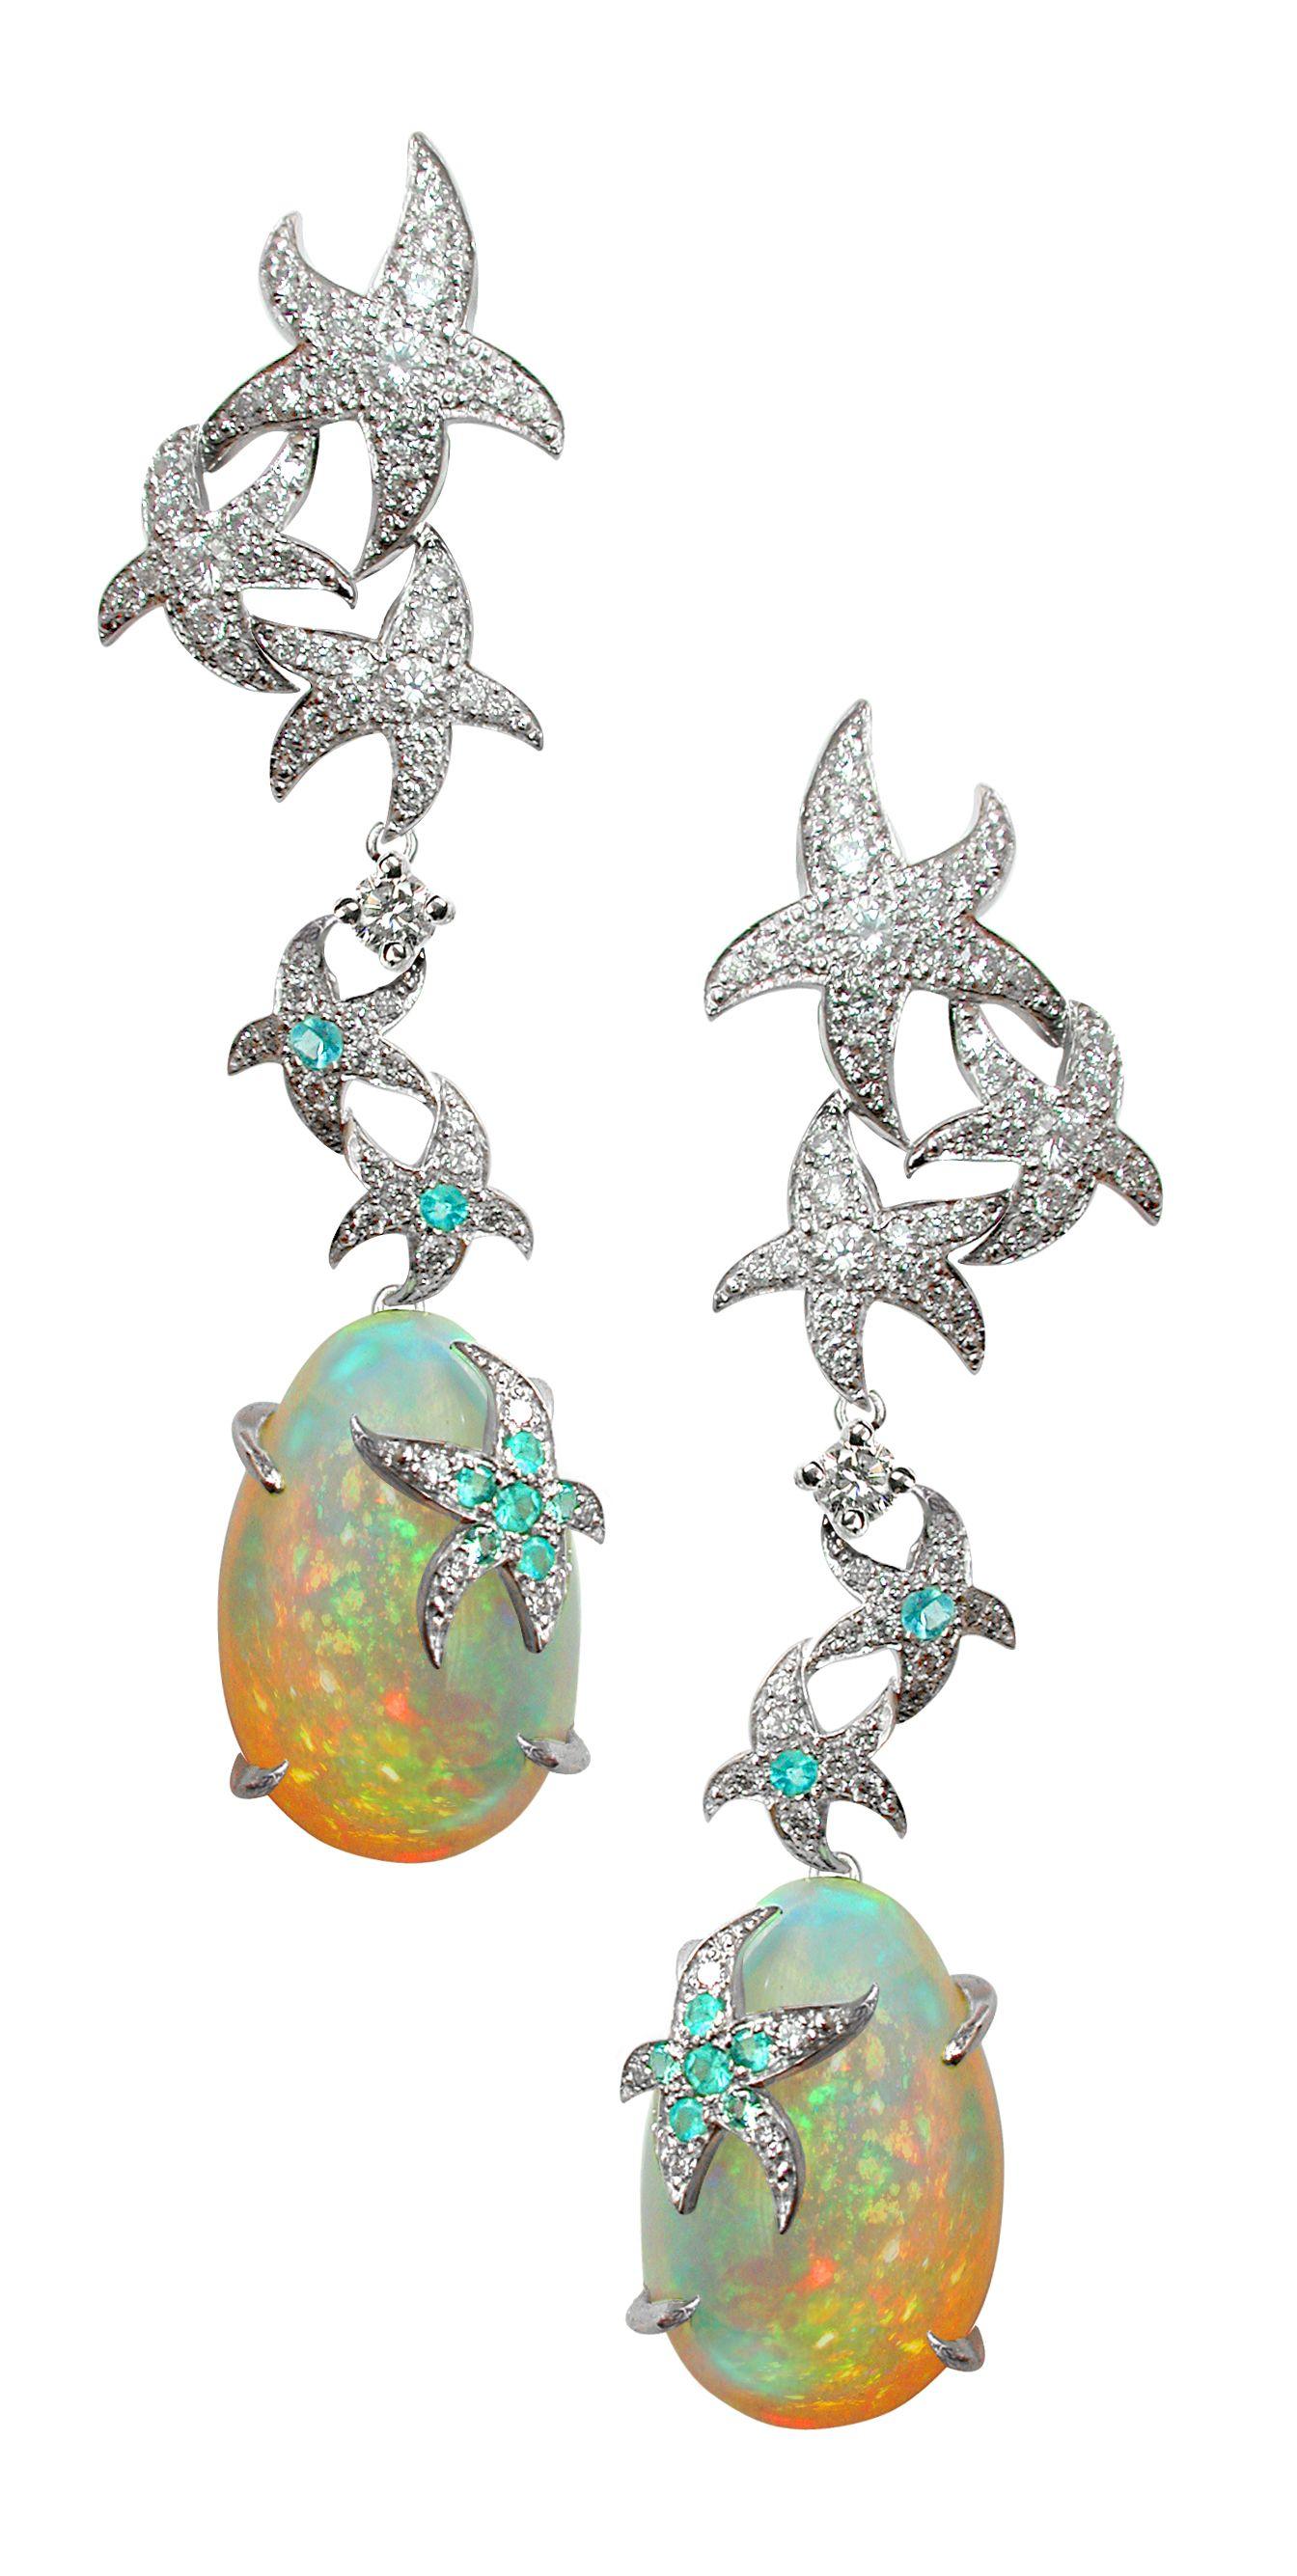 Oc 233 Ane Earrings Opals Diamonds Paraiba Tourmalins